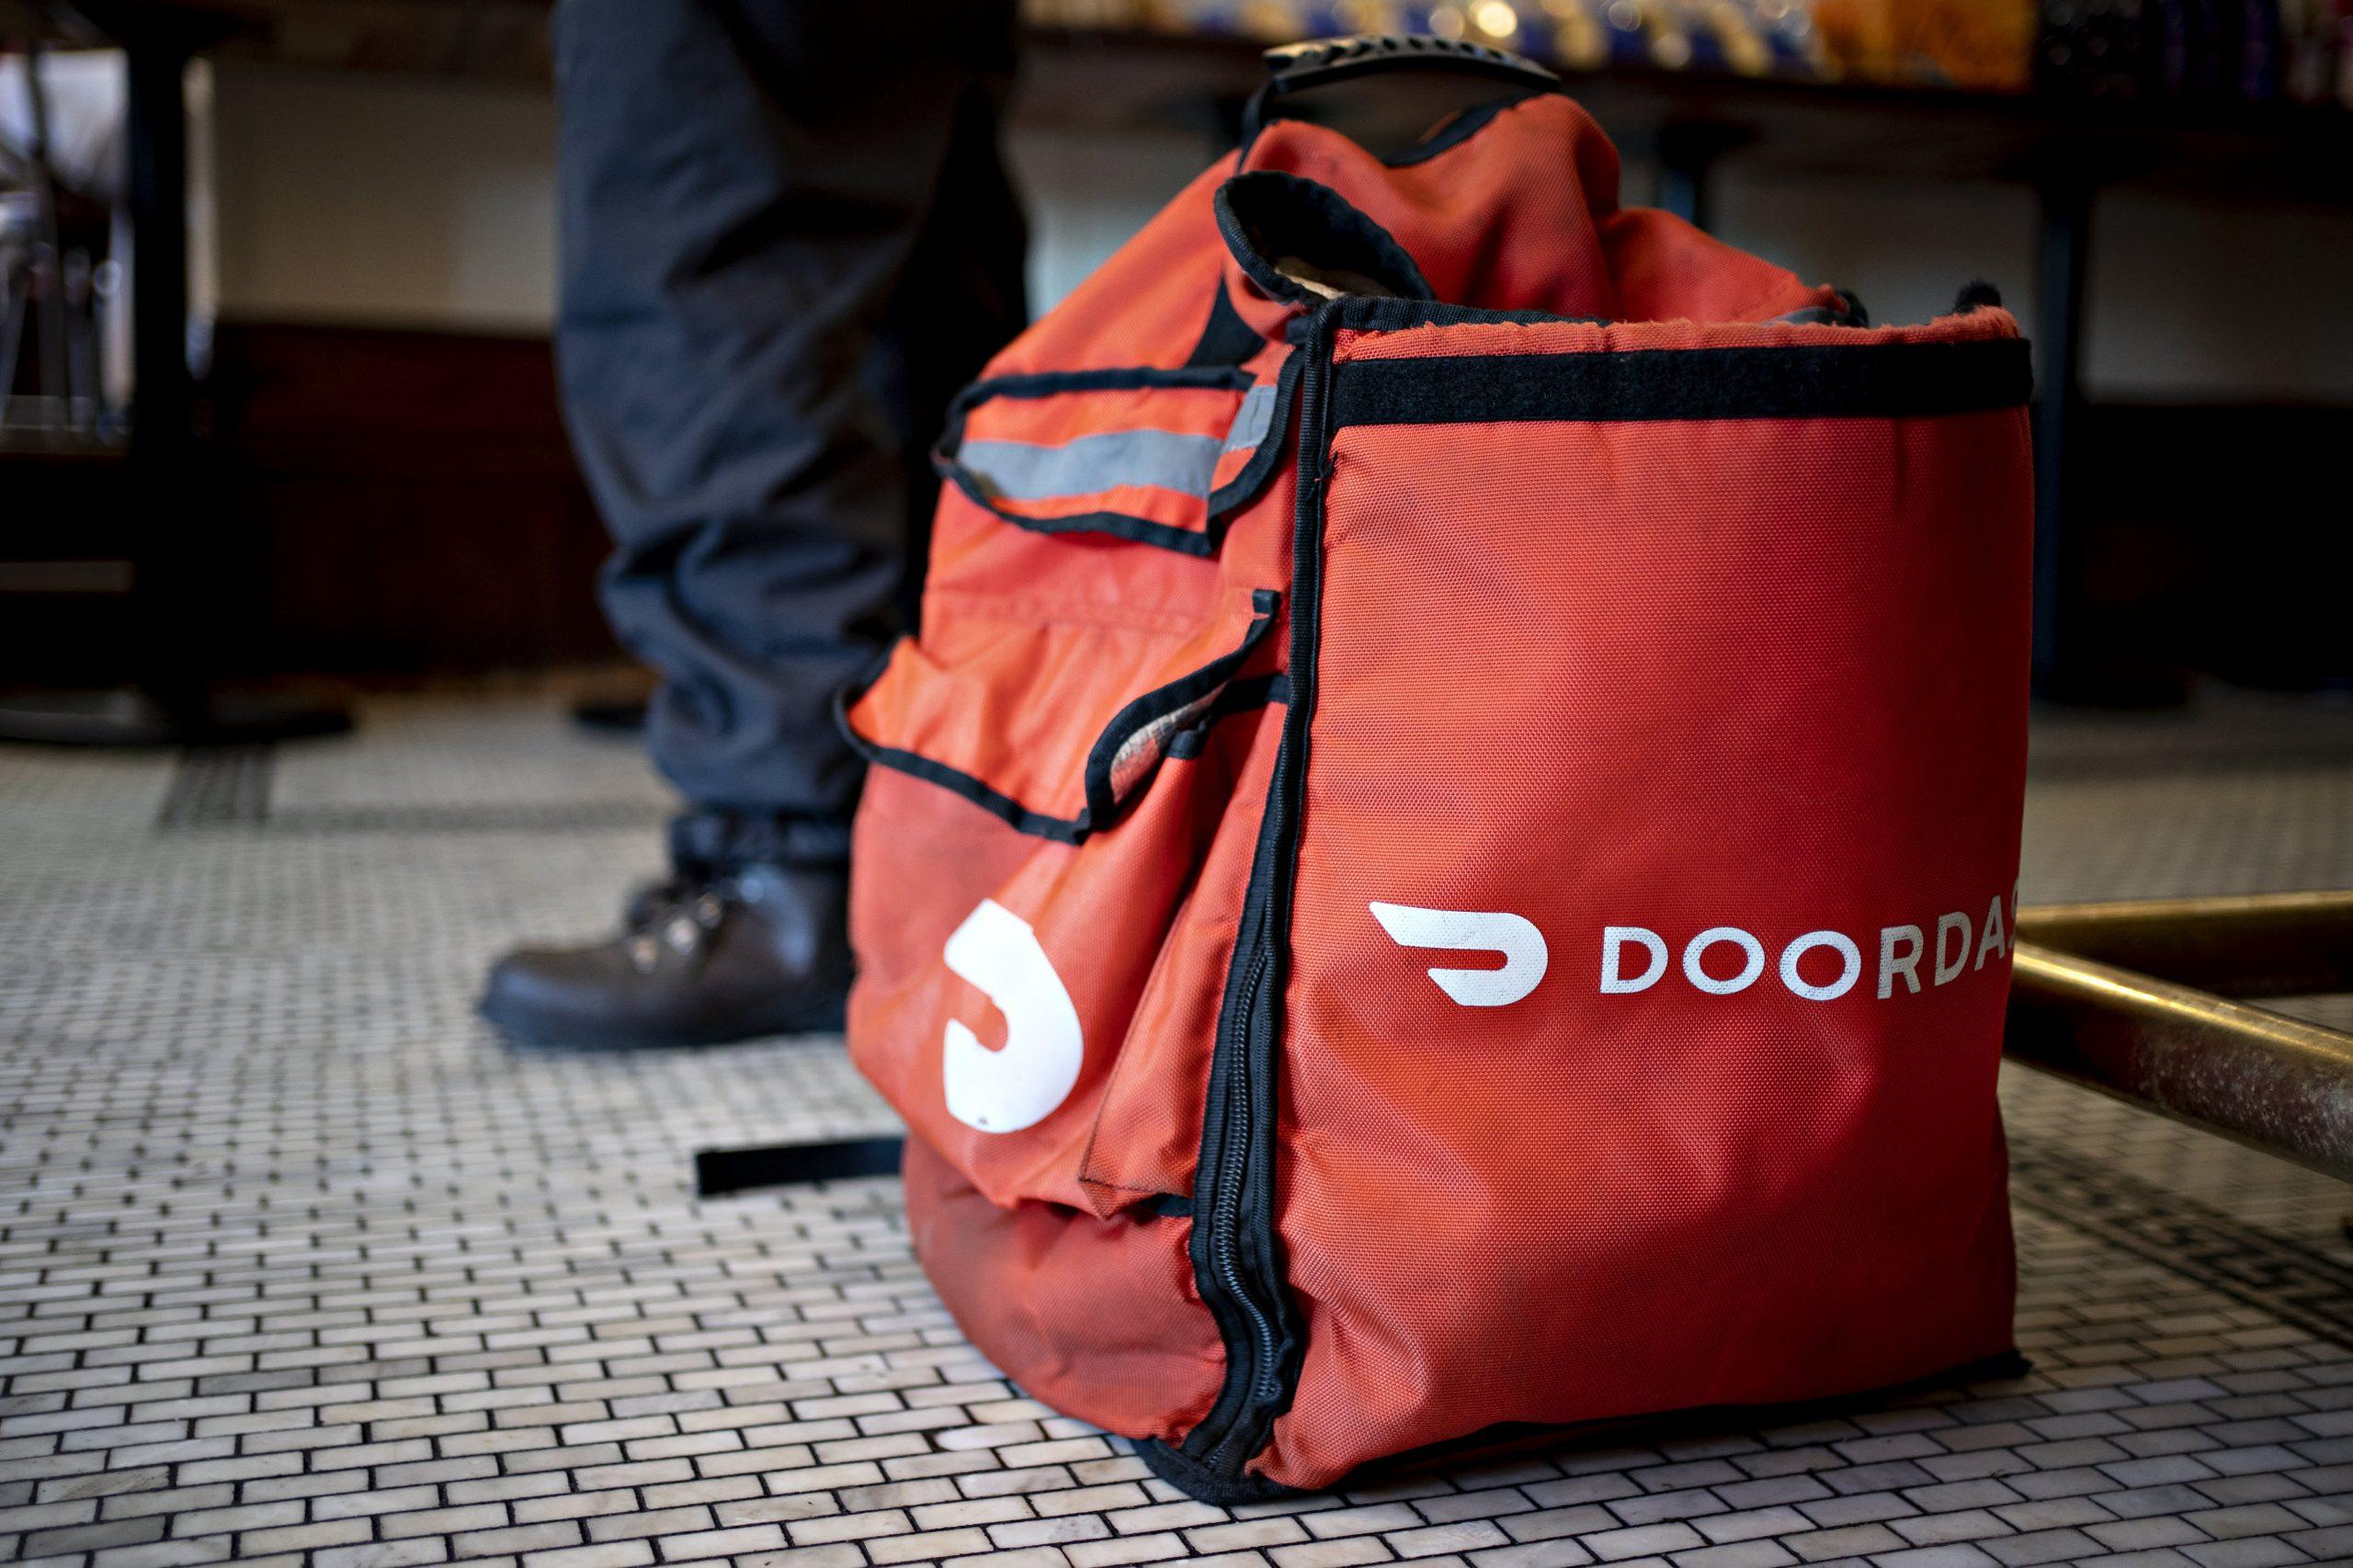 doordash-airbnb-dennys-virgin-galactic-arvinas